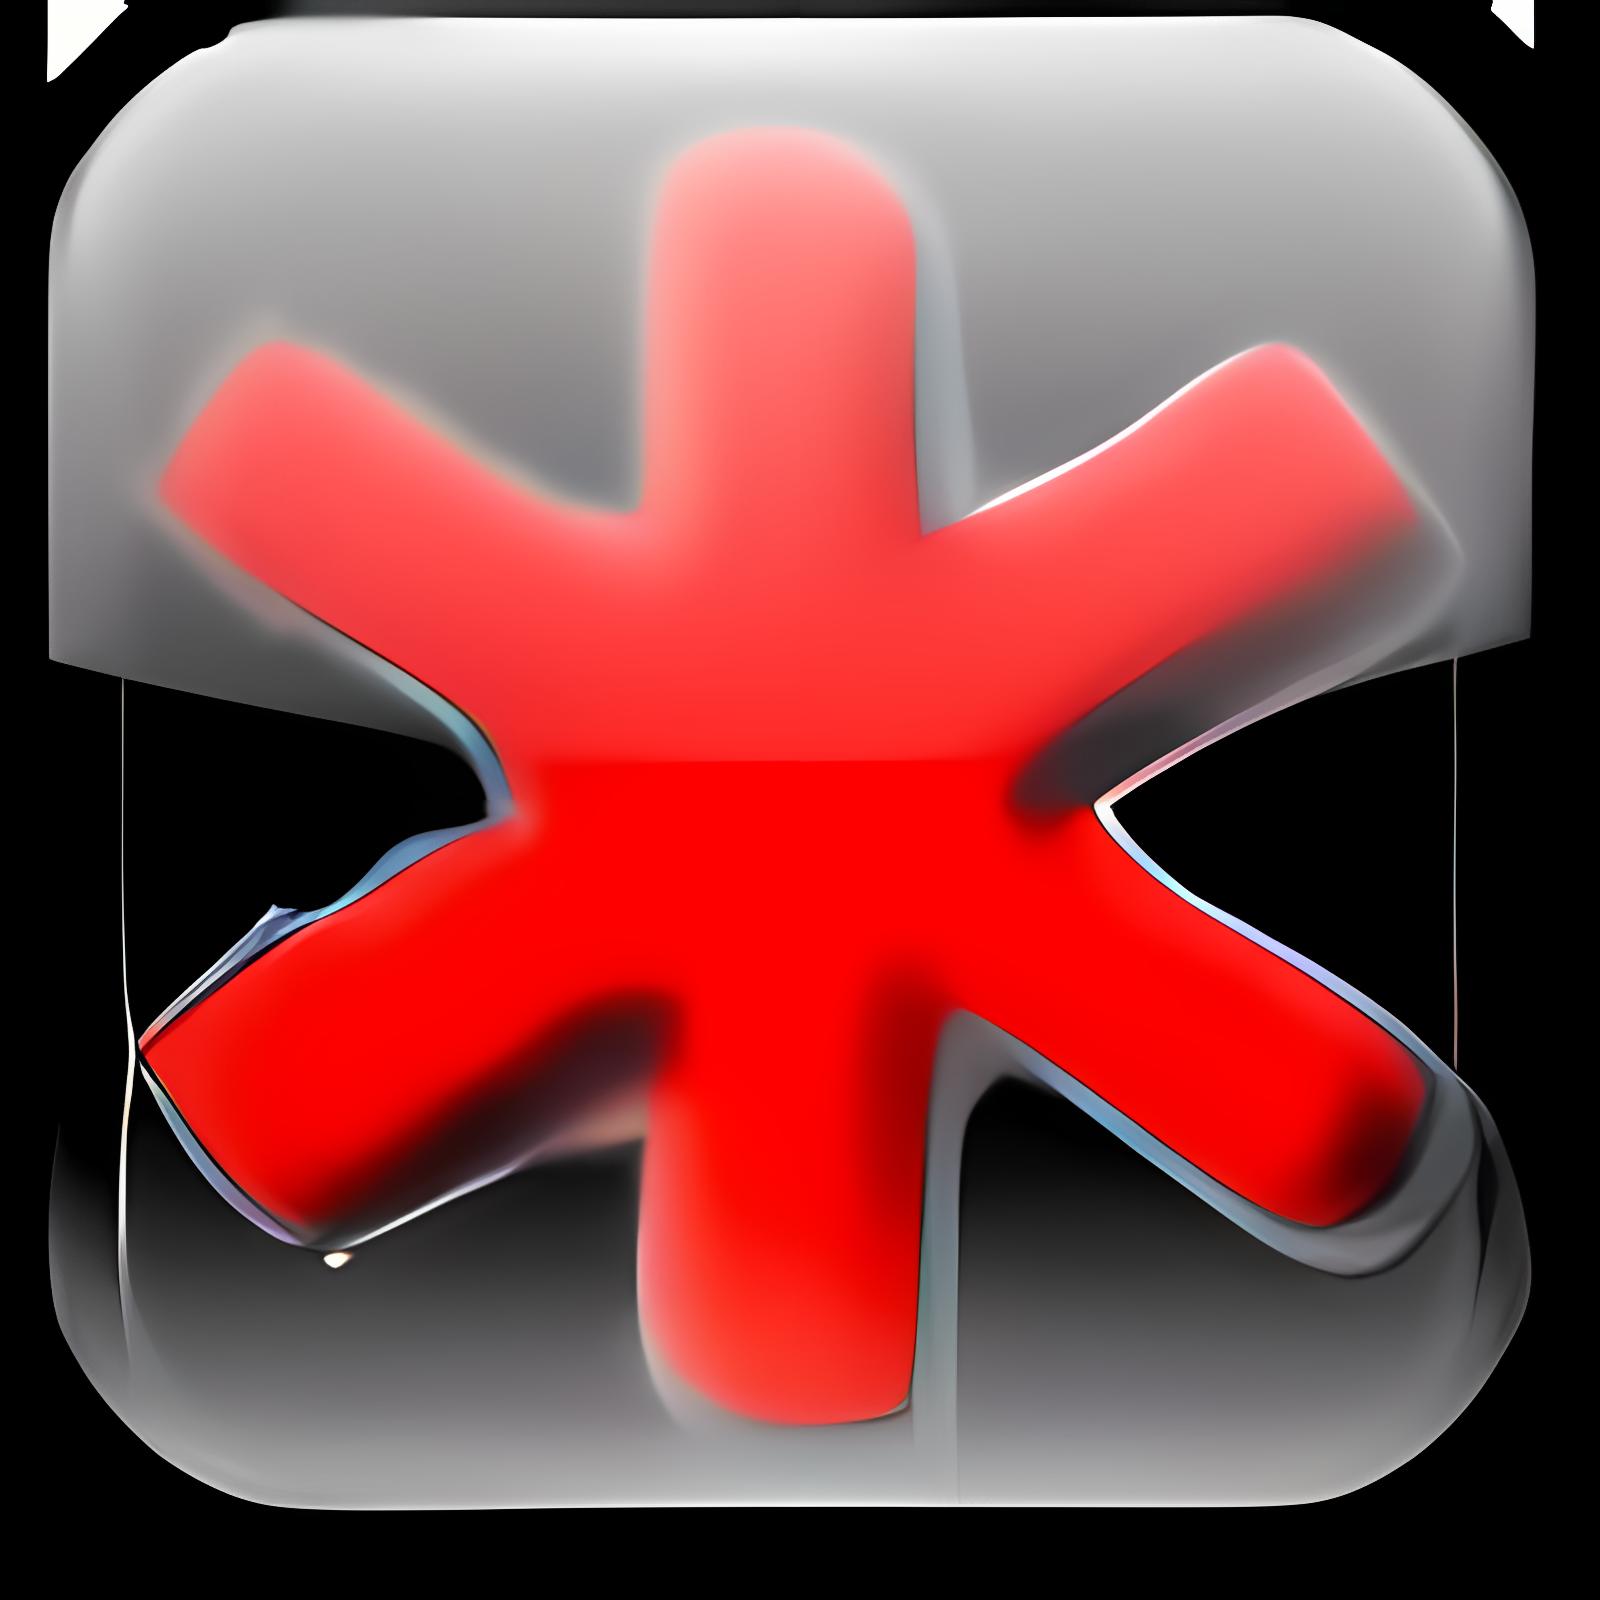 ControlPad 0.65